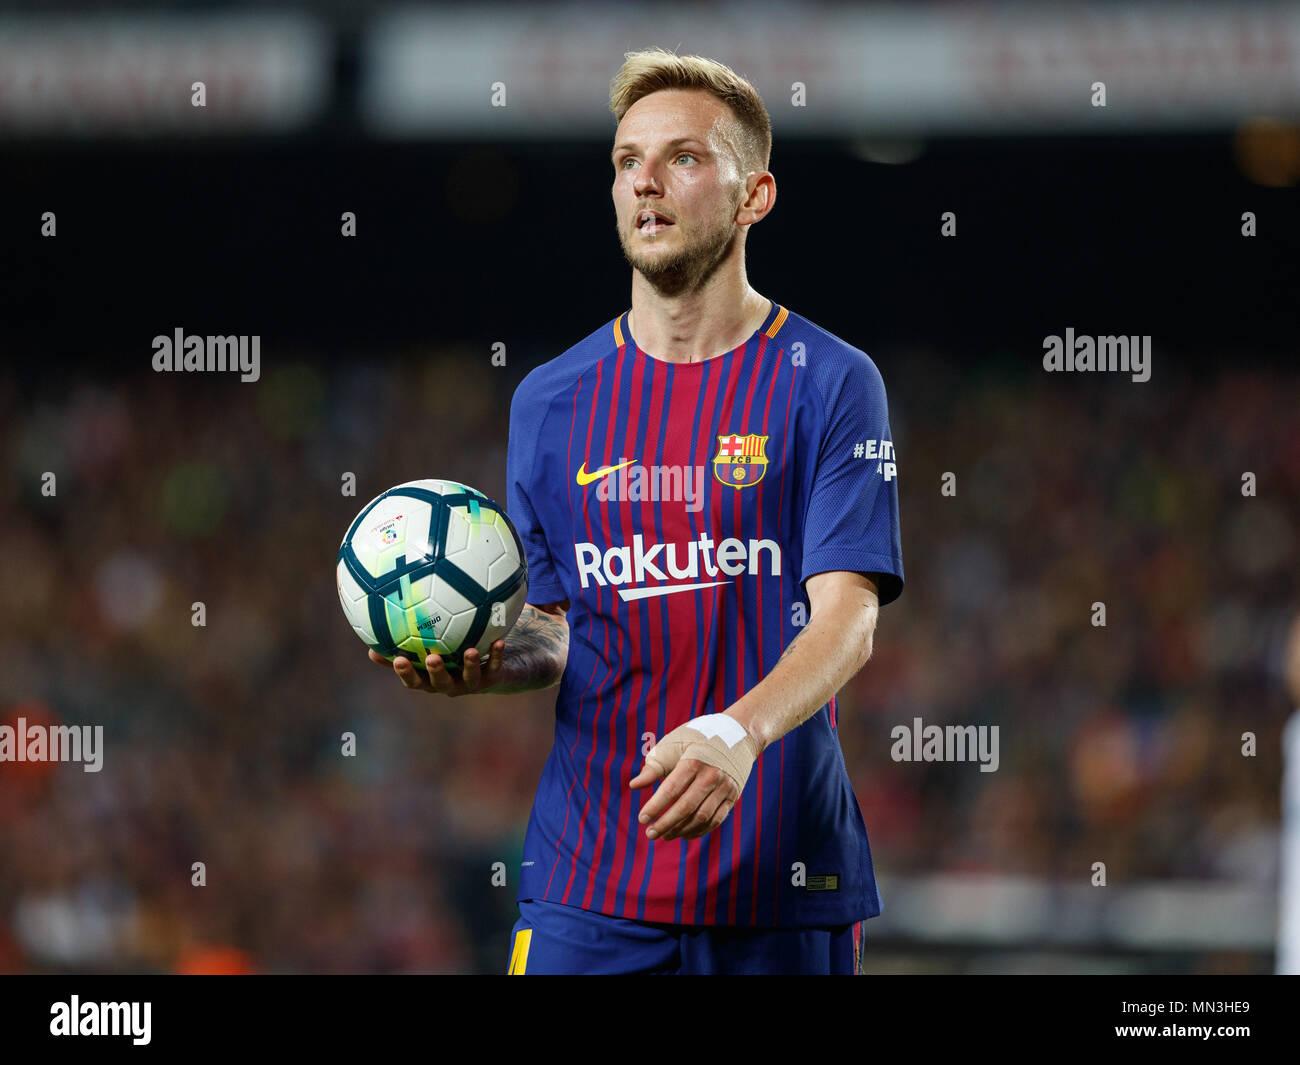 Barcelona, 6th May: Ivan Rakitic of FC Barcelona during the 2017/2018 LaLiga Santander Round 36 game between FC Barcelona and Real Madrid at Camp Nou  - Stock Image